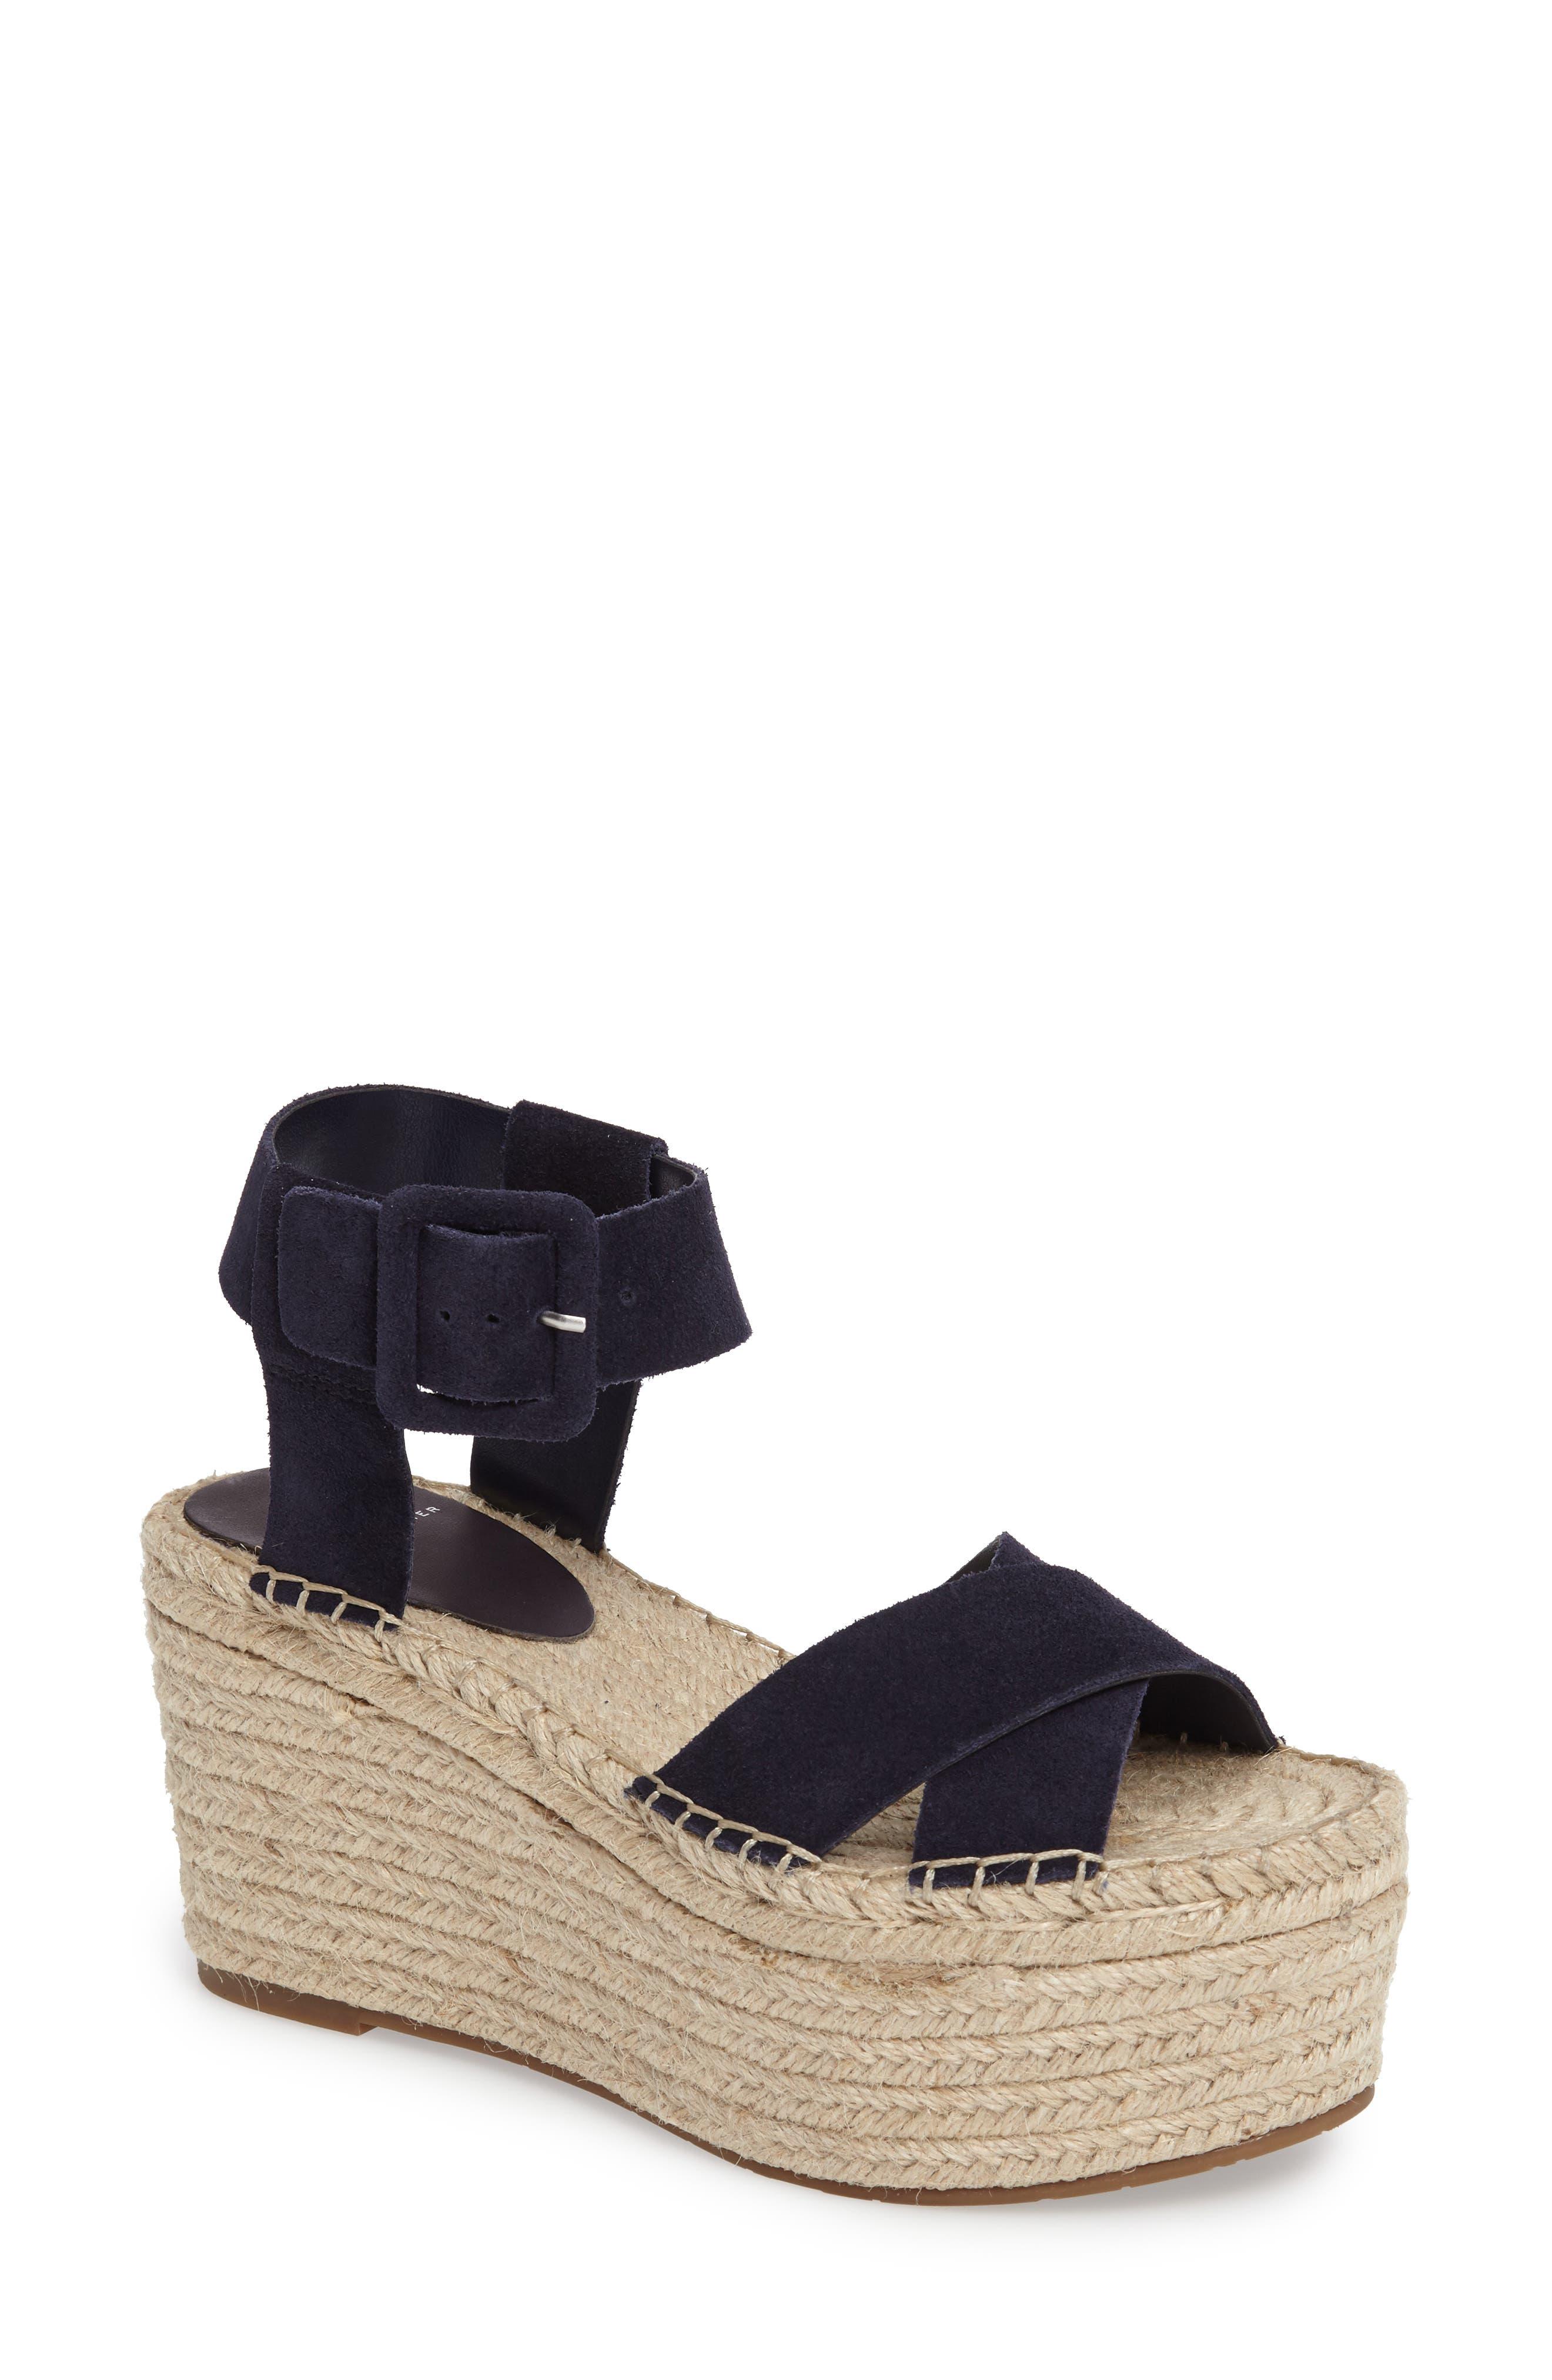 6f745a93a952 Marc Fisher LTD Sandals - Women s